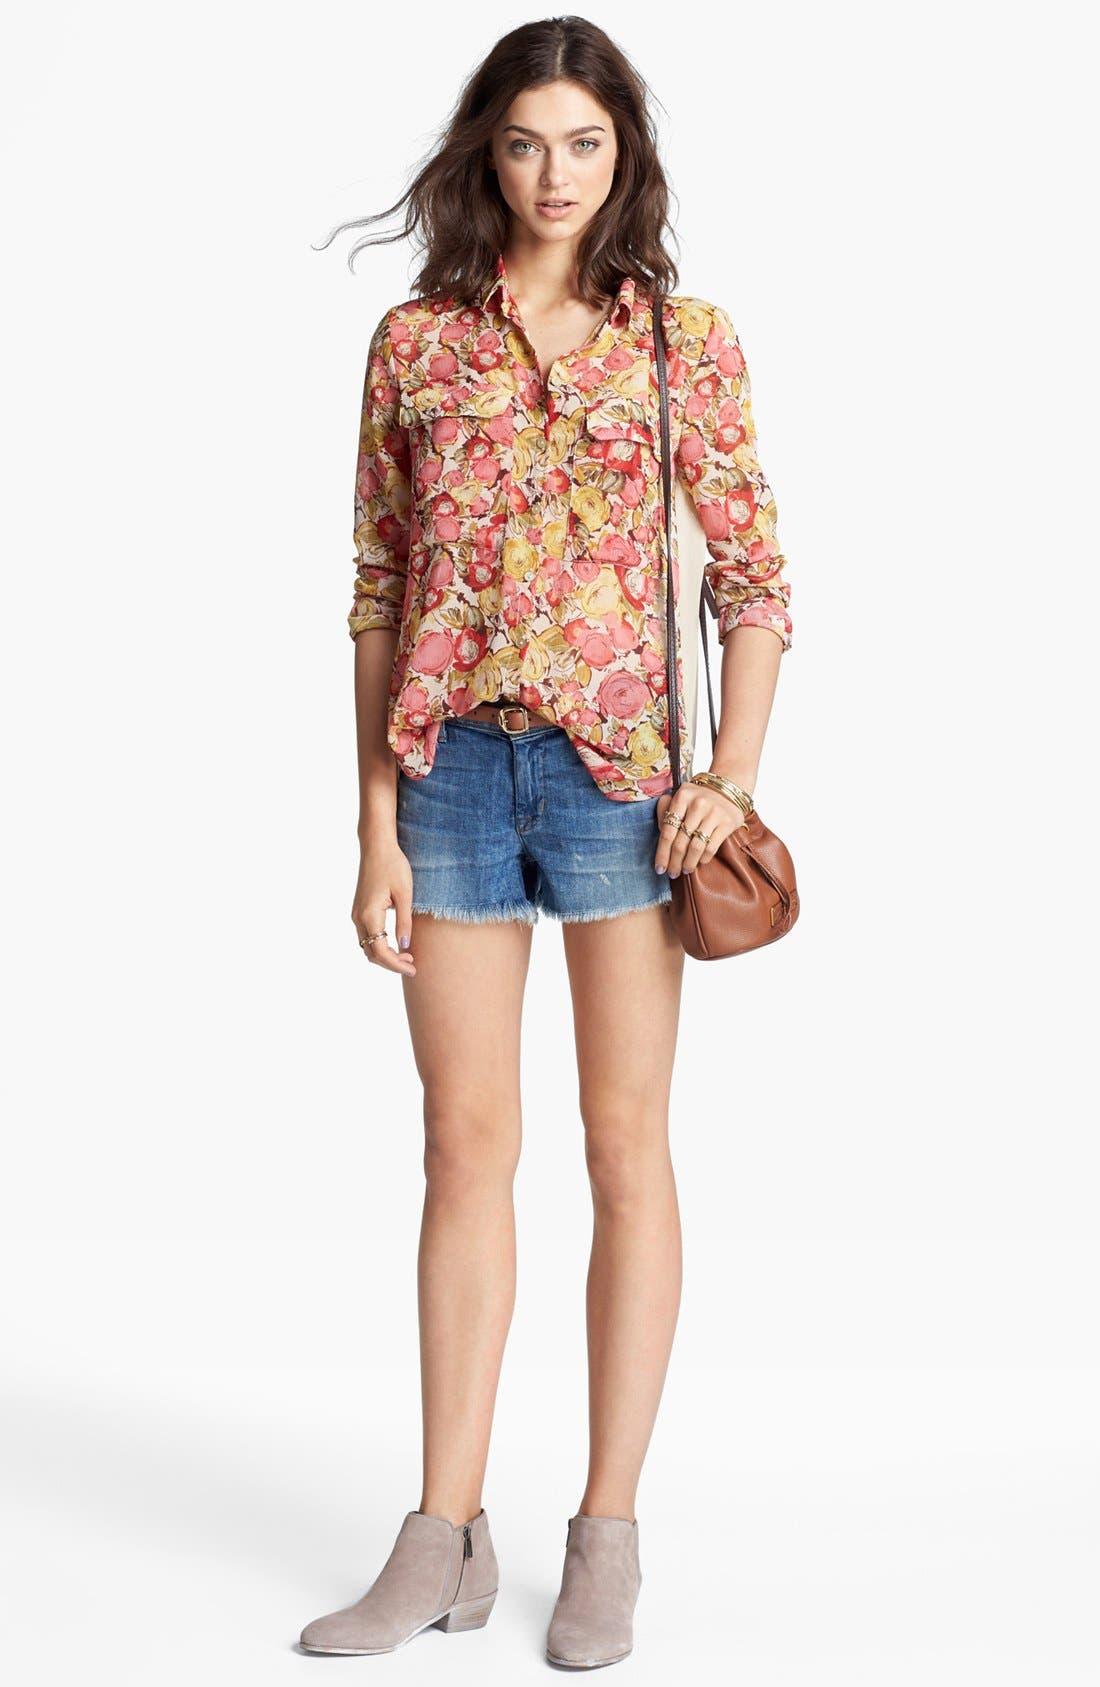 Main Image - KUT from the Kloth Top & Hudson Jeans Denim Shorts